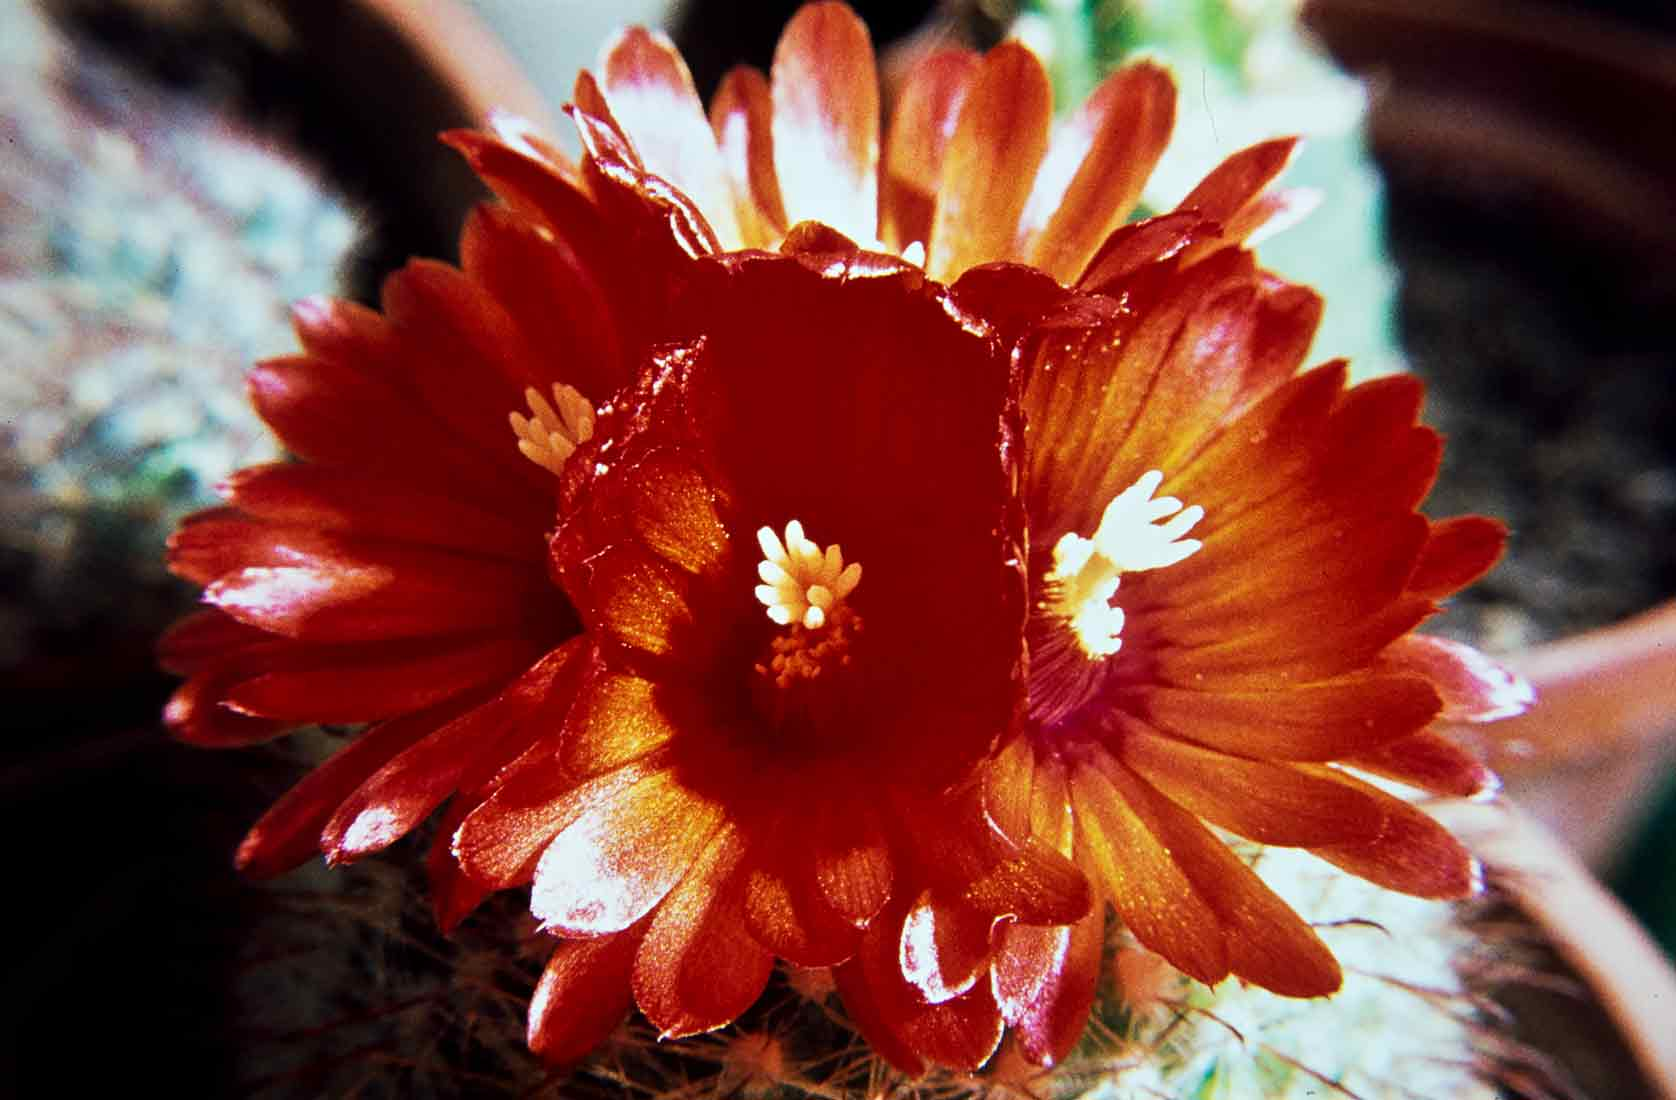 Parodia sangniniflora 1975